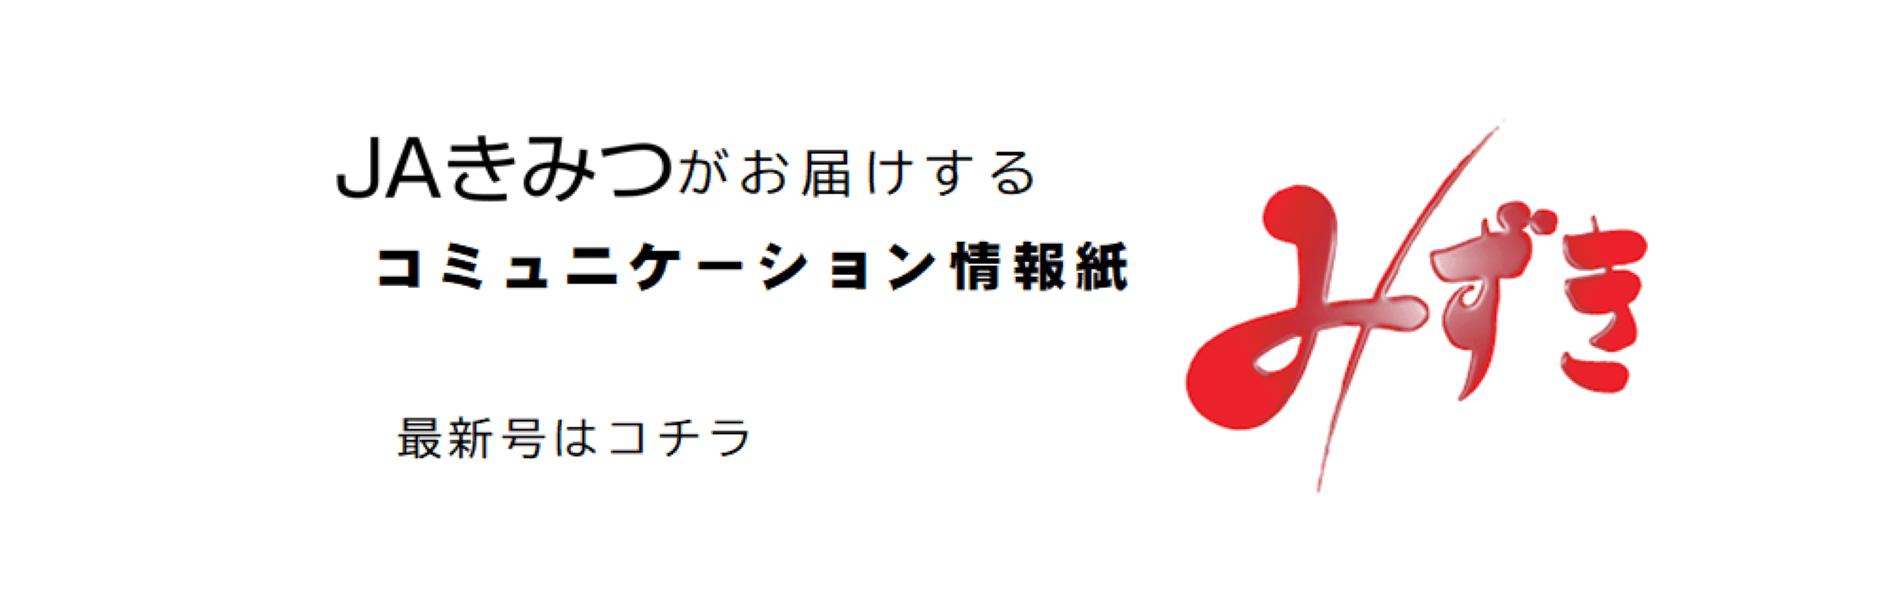 http://ja-kimitu.or.jp/mizuki2021/